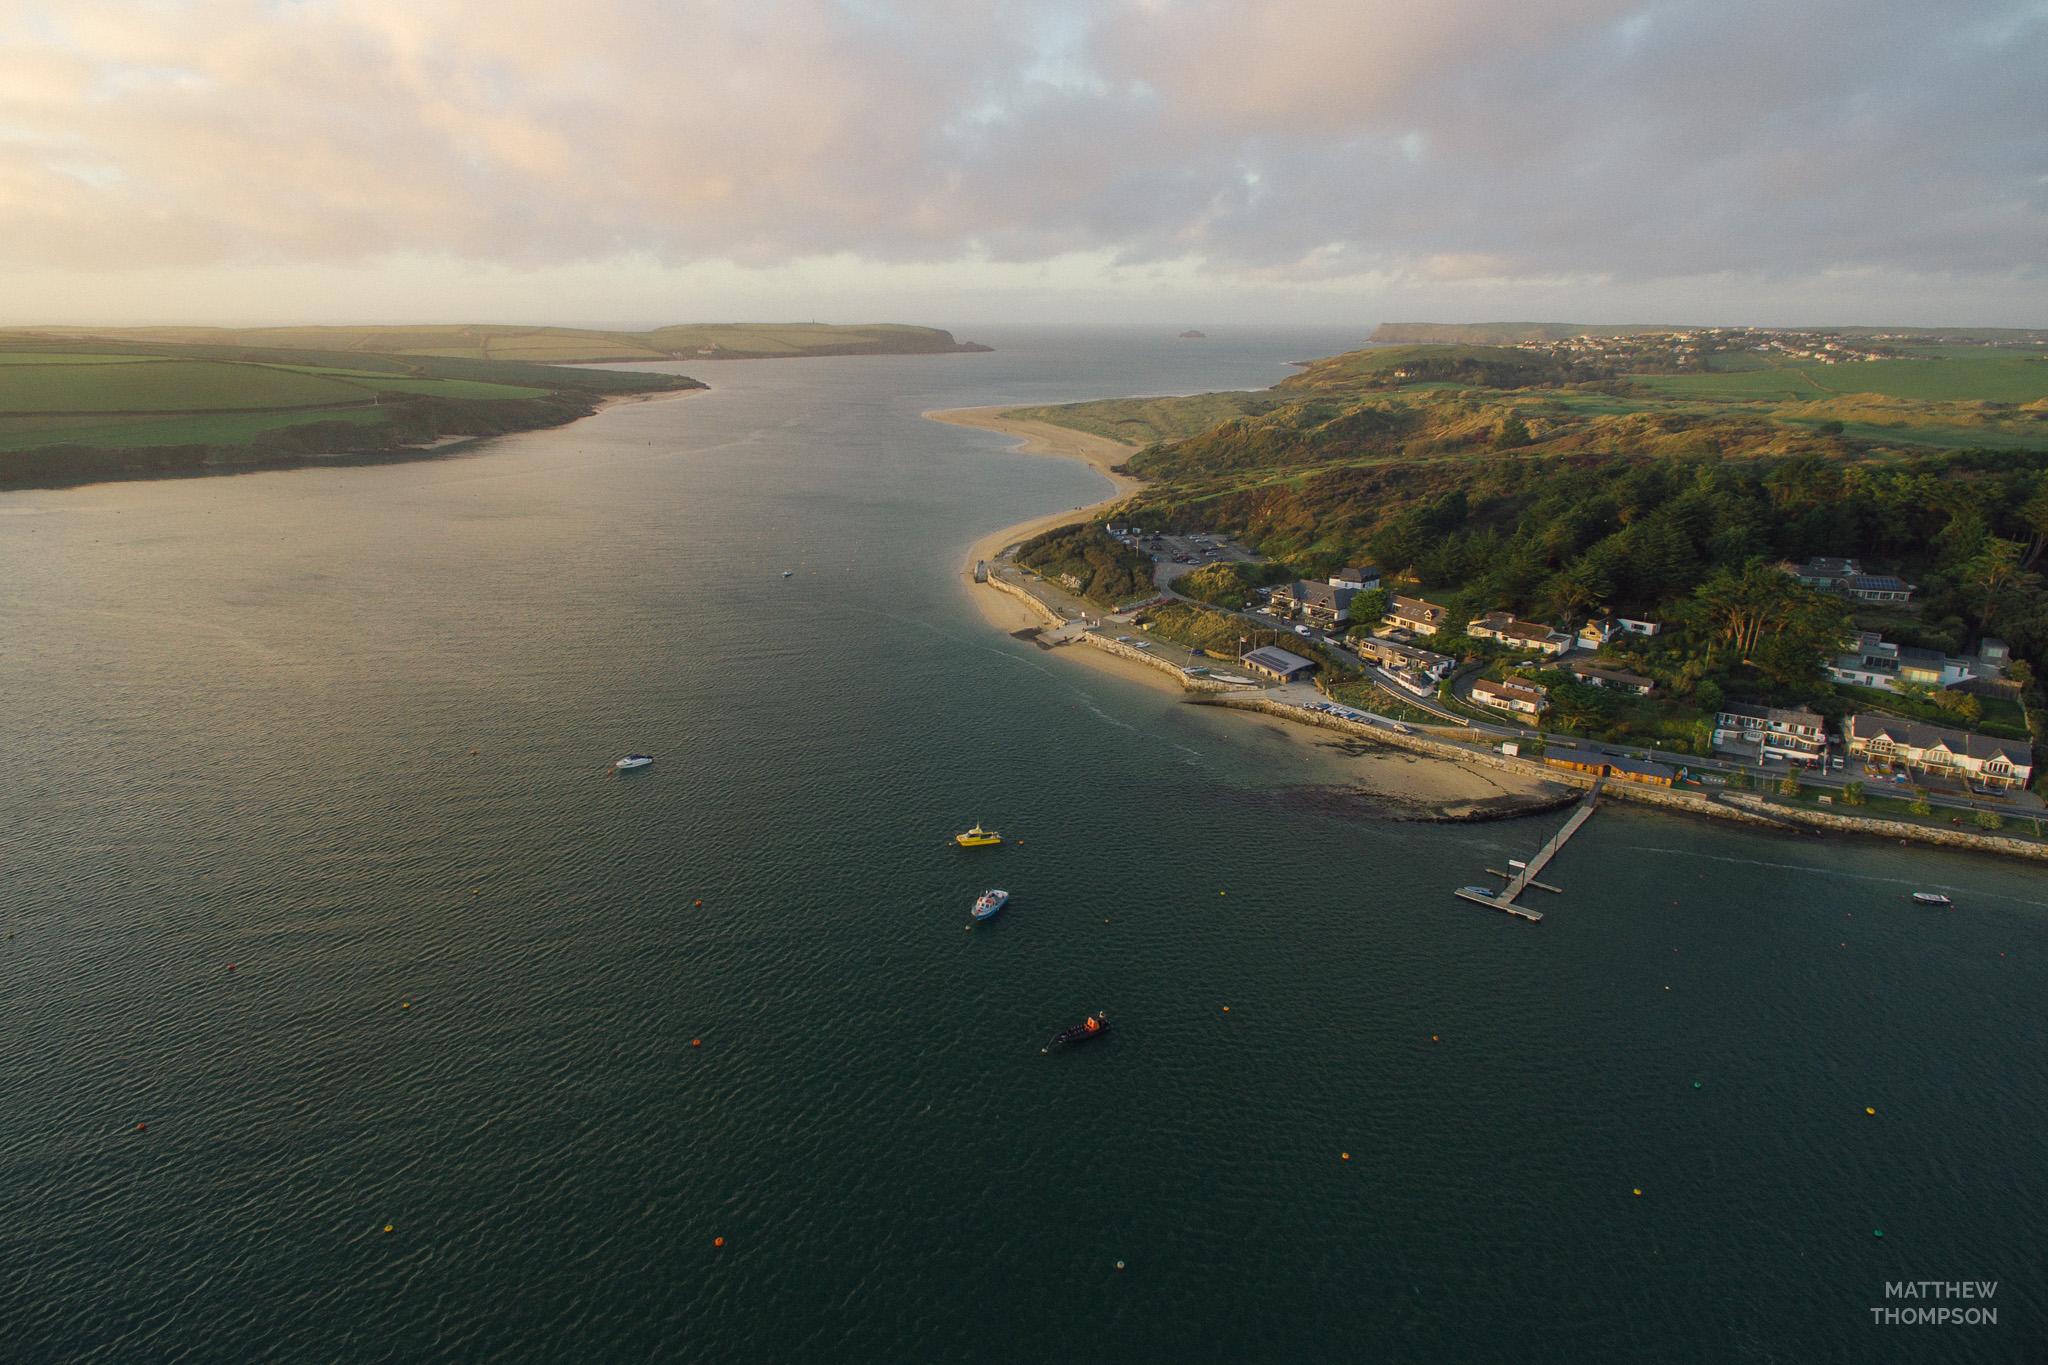 151107-Cornwall-Aerial-23-Edit-W.jpg